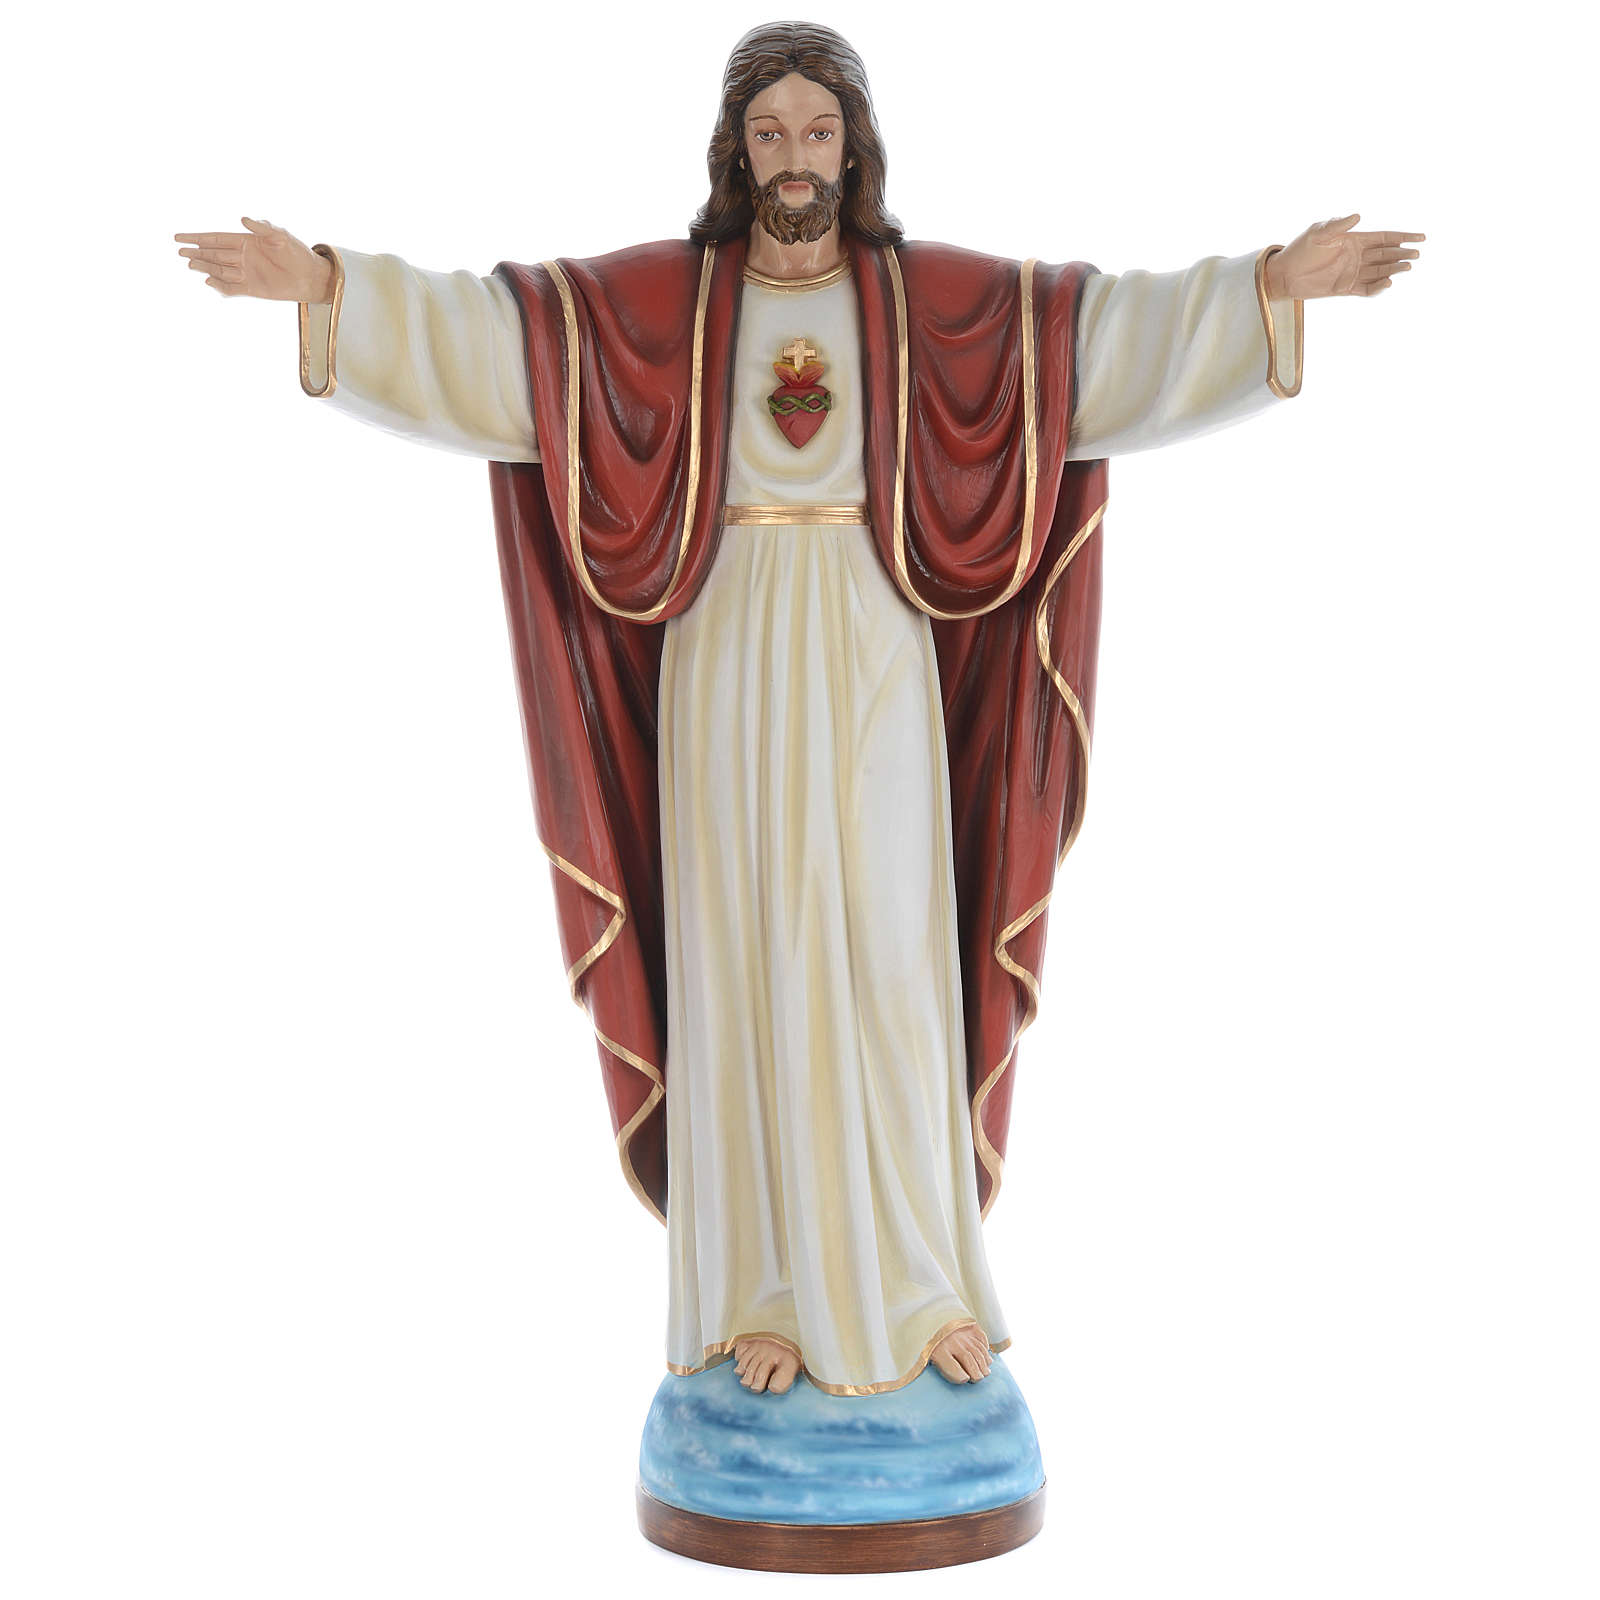 Statua Gesù Redentore 160 cm vetroresina dipinta PER ESTERNO 4